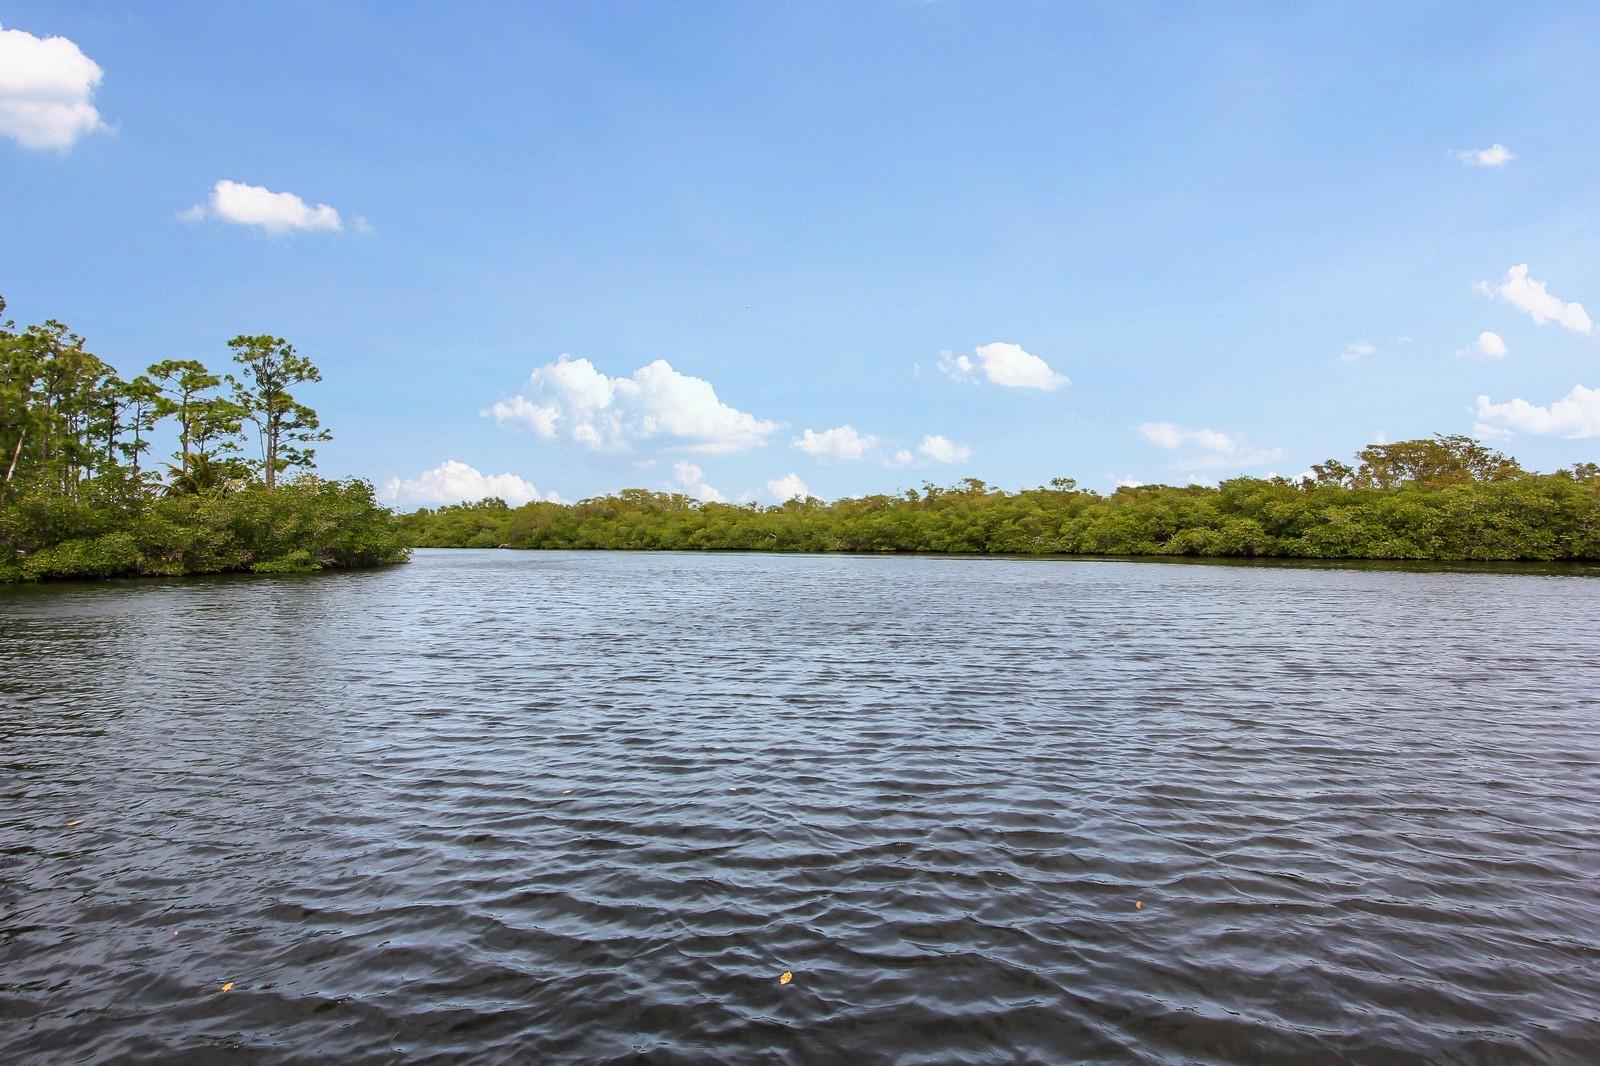 Real Estate Photography - 18300 SE Loxahatchee River Rd, Jupiter, FL, 33458 - Intracoastal View